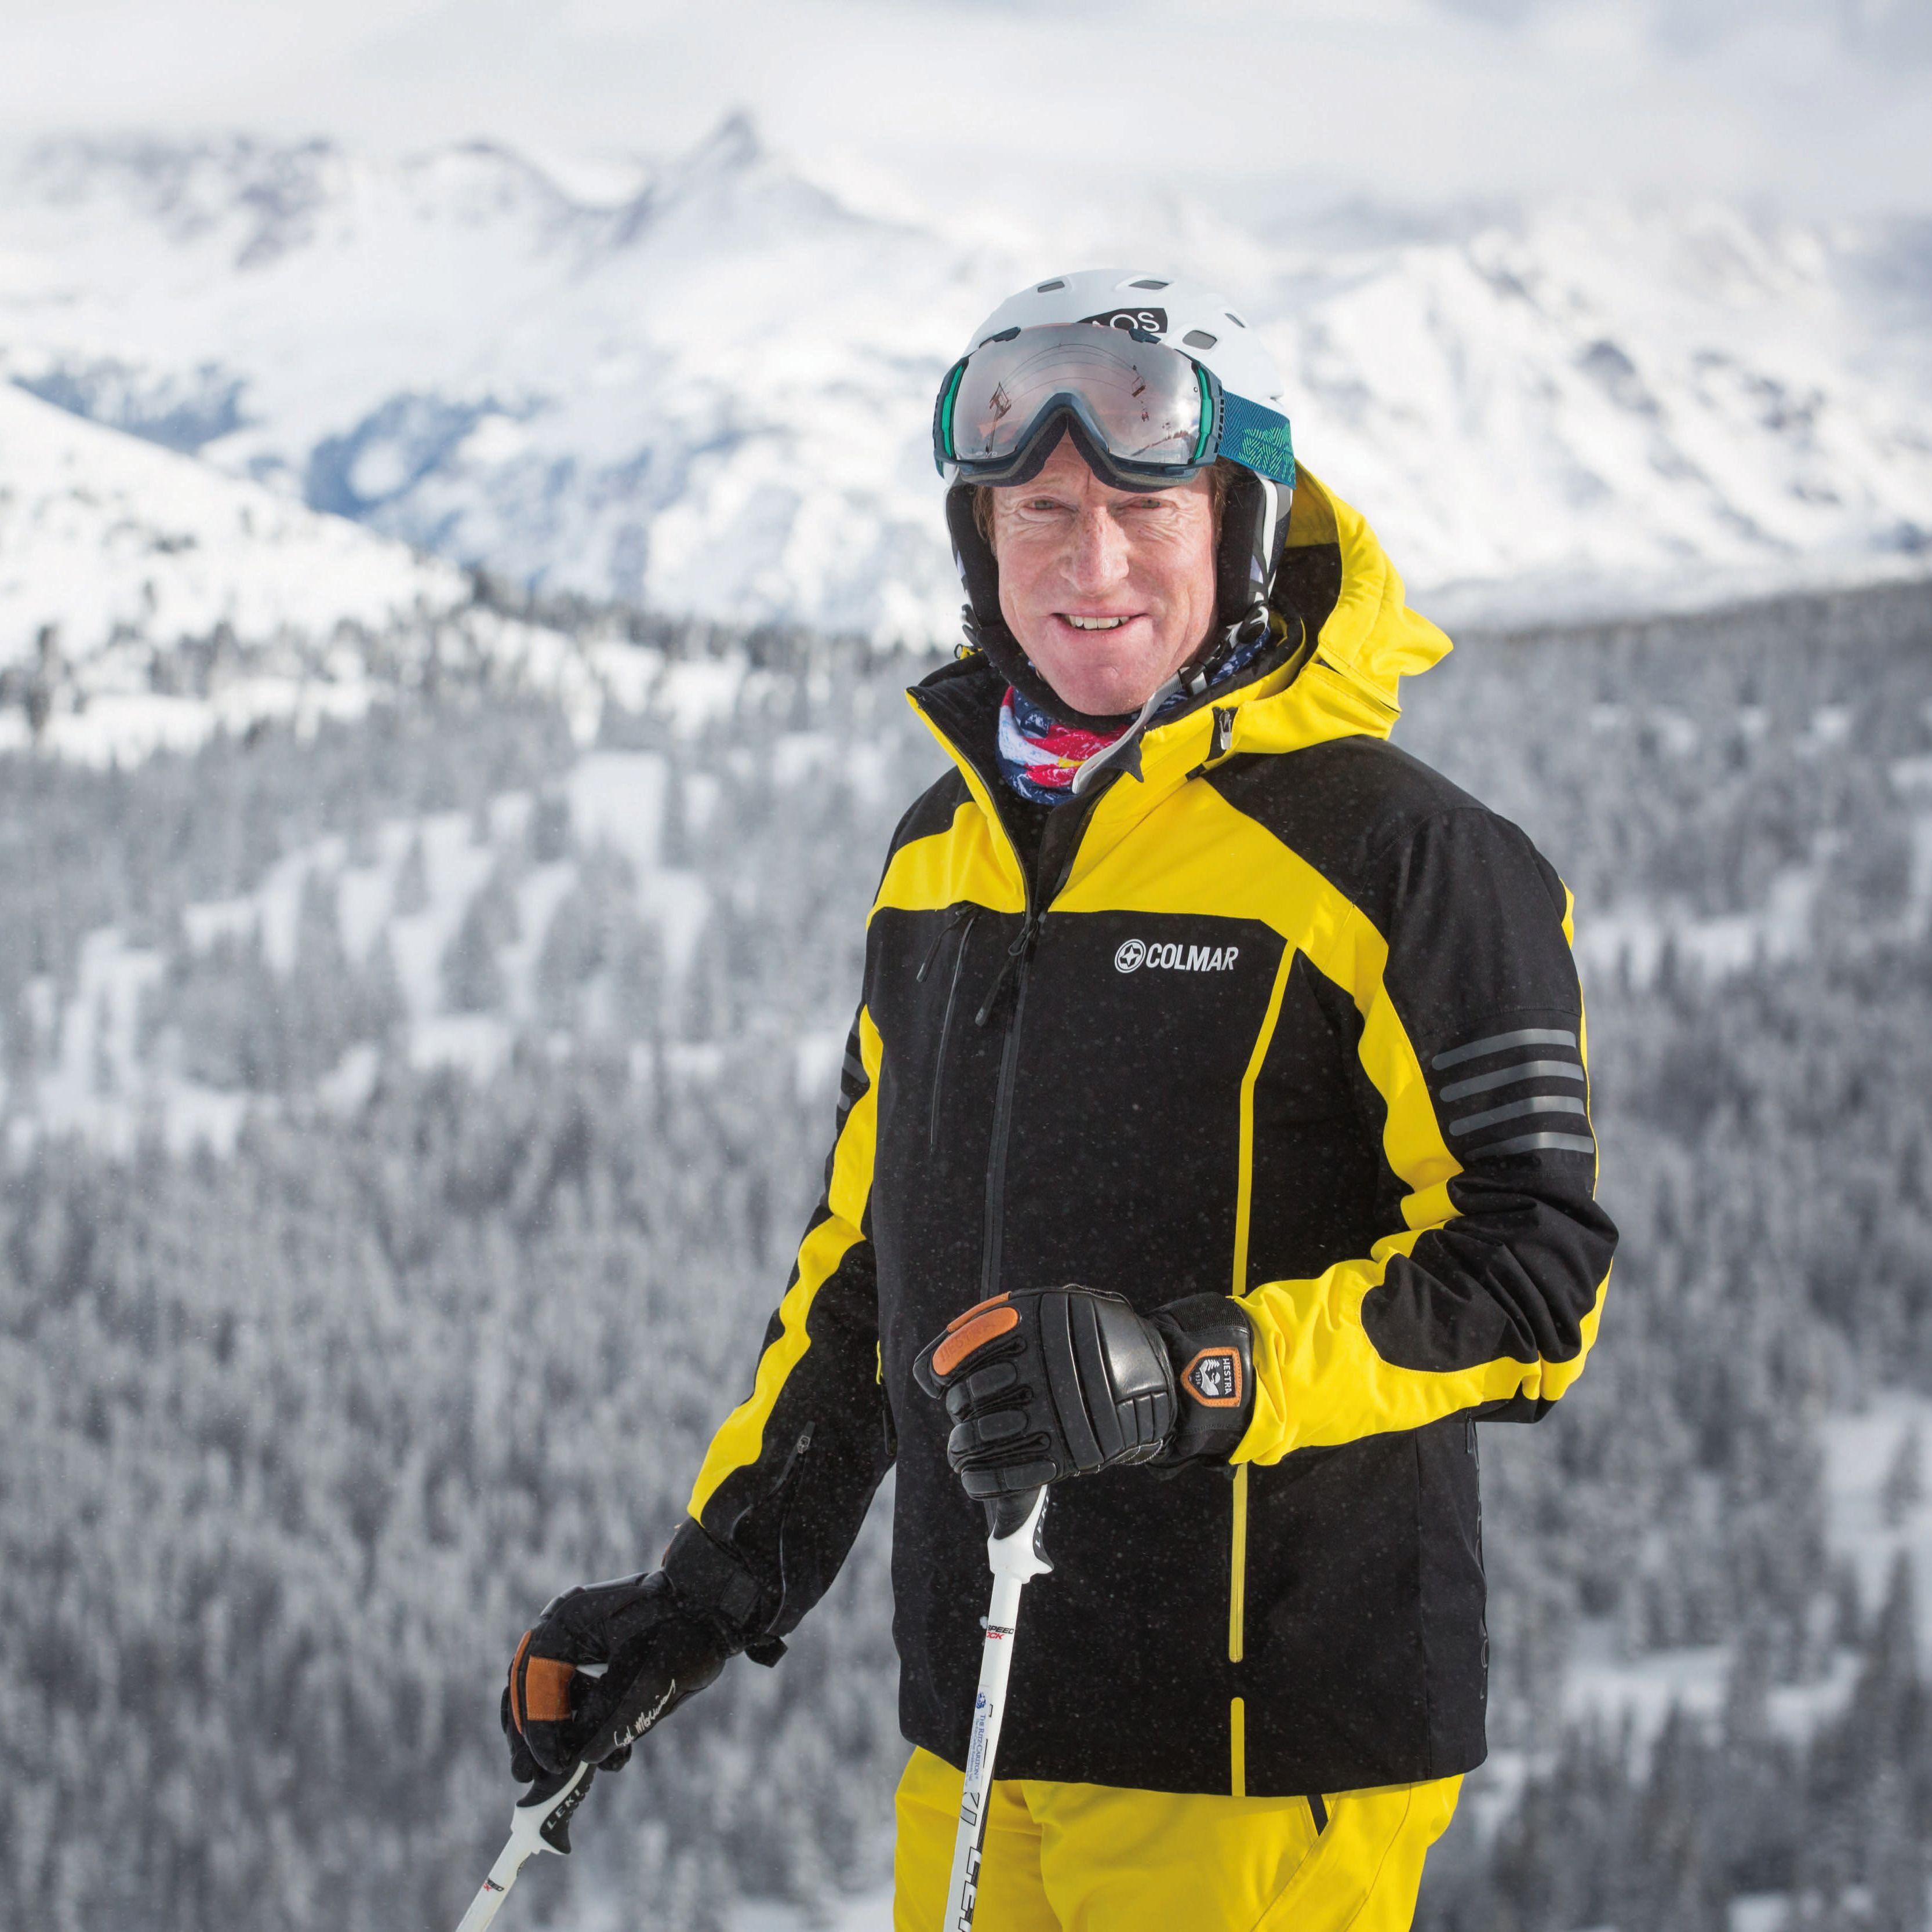 Chrisanthony skiing incw1f